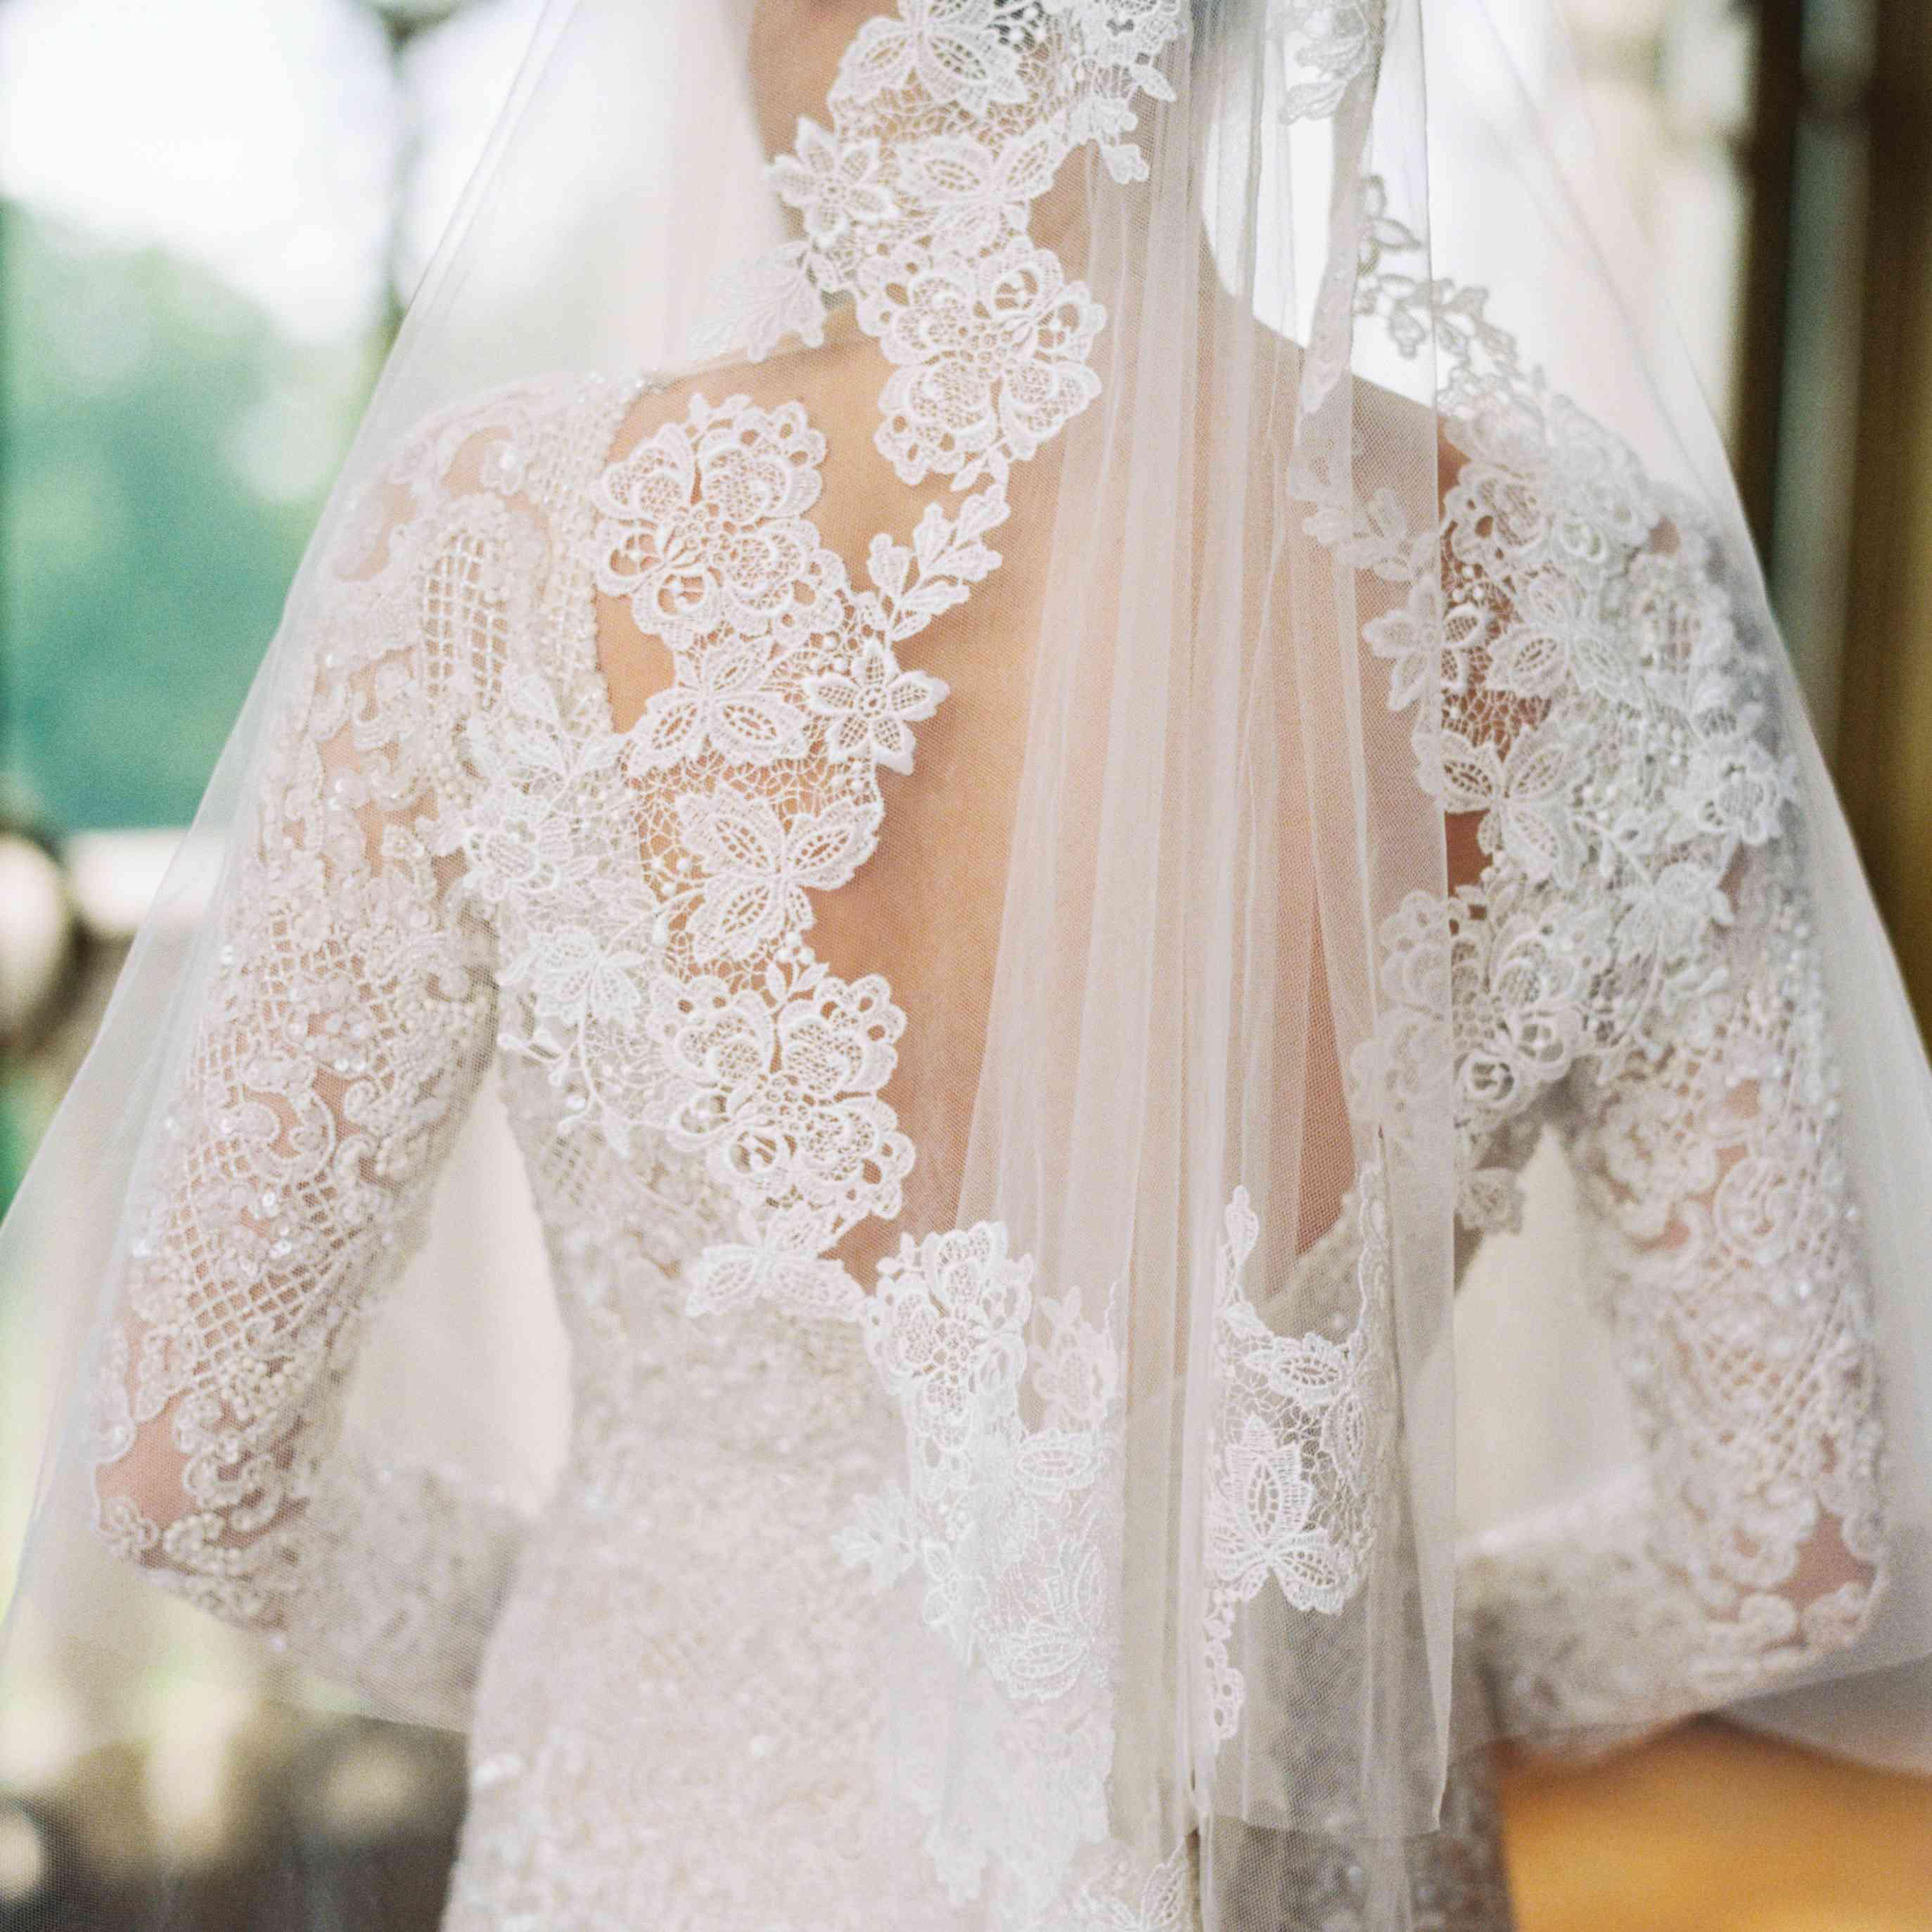 Northern Italian Wedding, Lace Veil